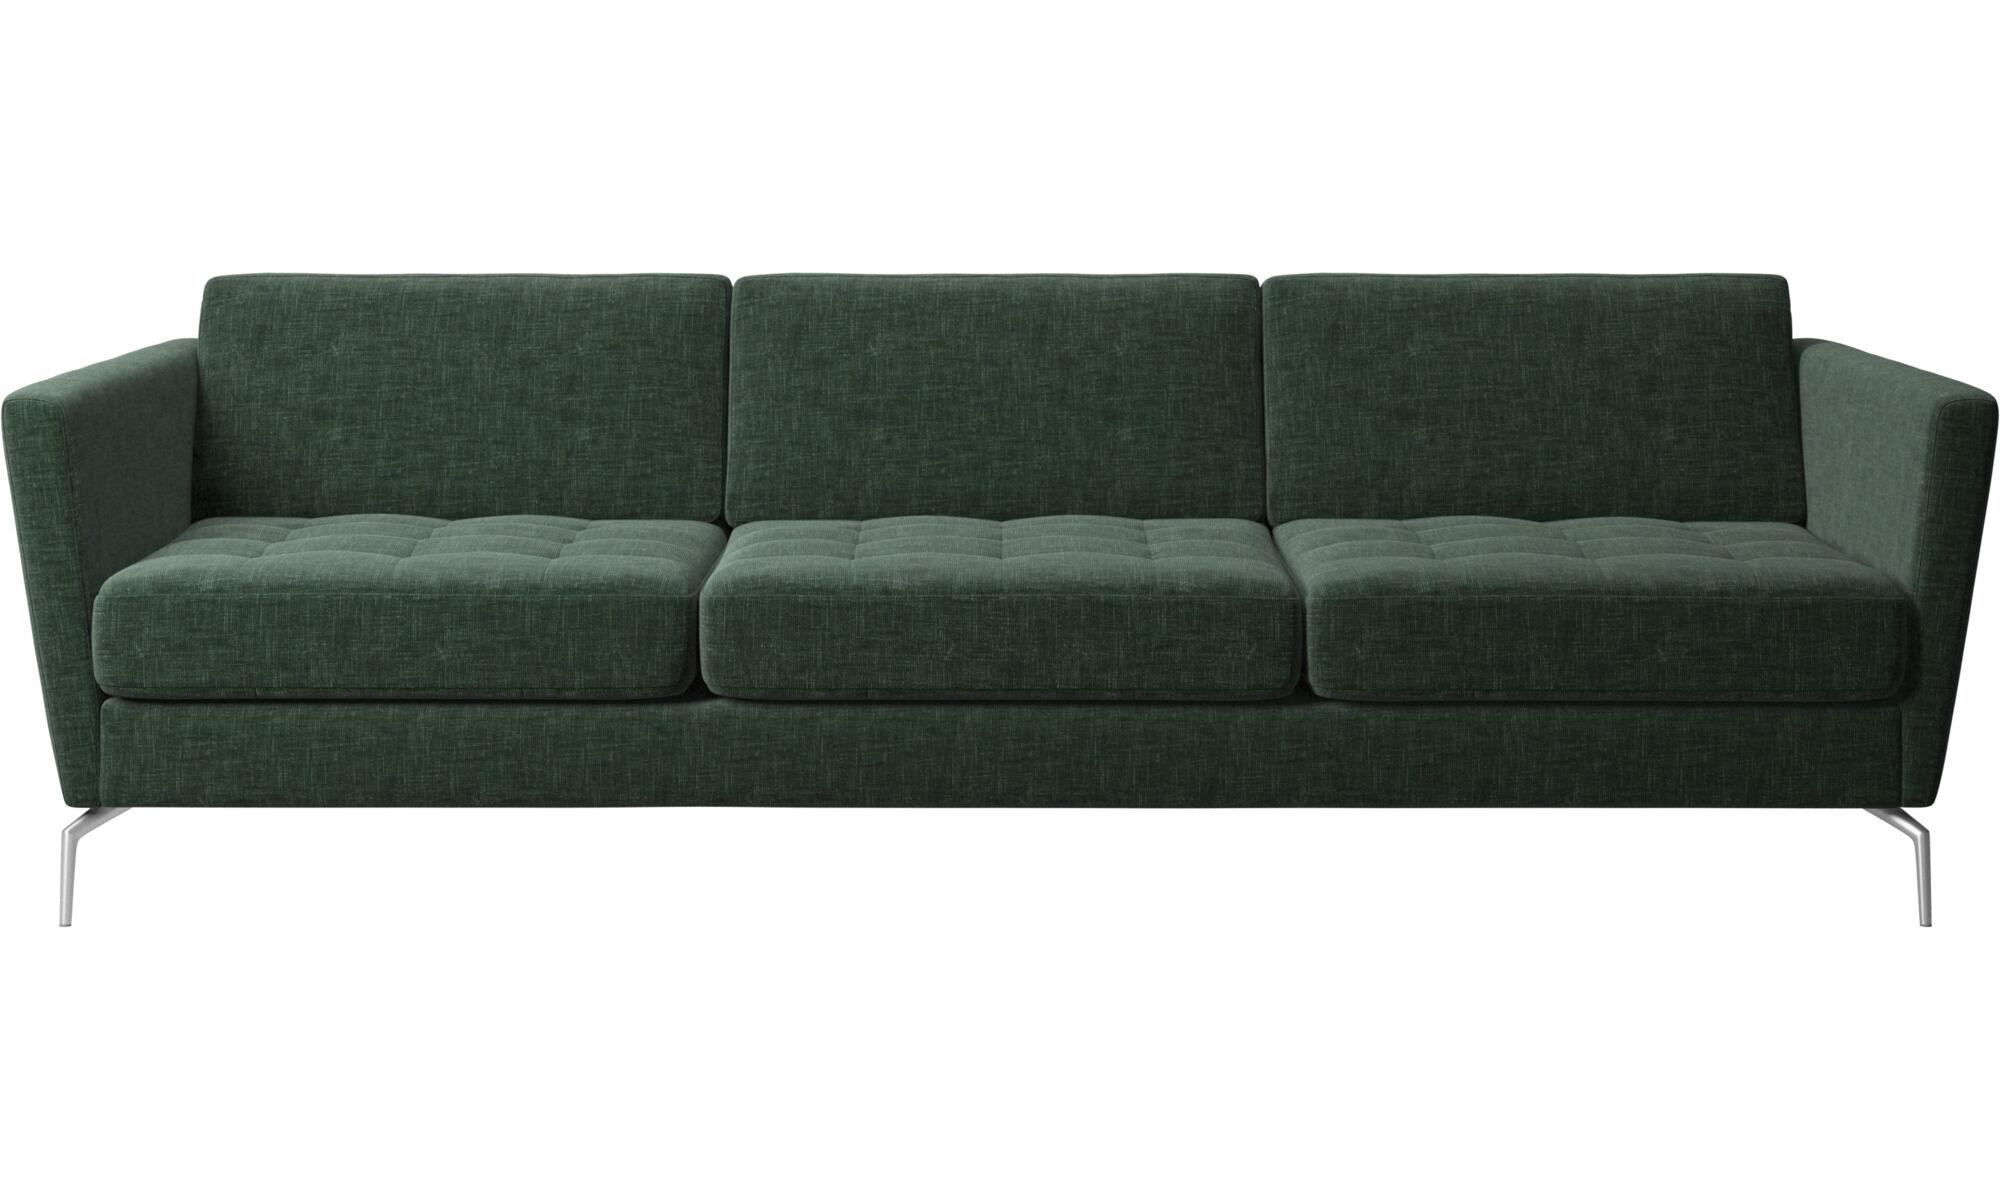 3 Seater Sofas   Osaka Sofa, Tufted Seat   Green   Fabric ...